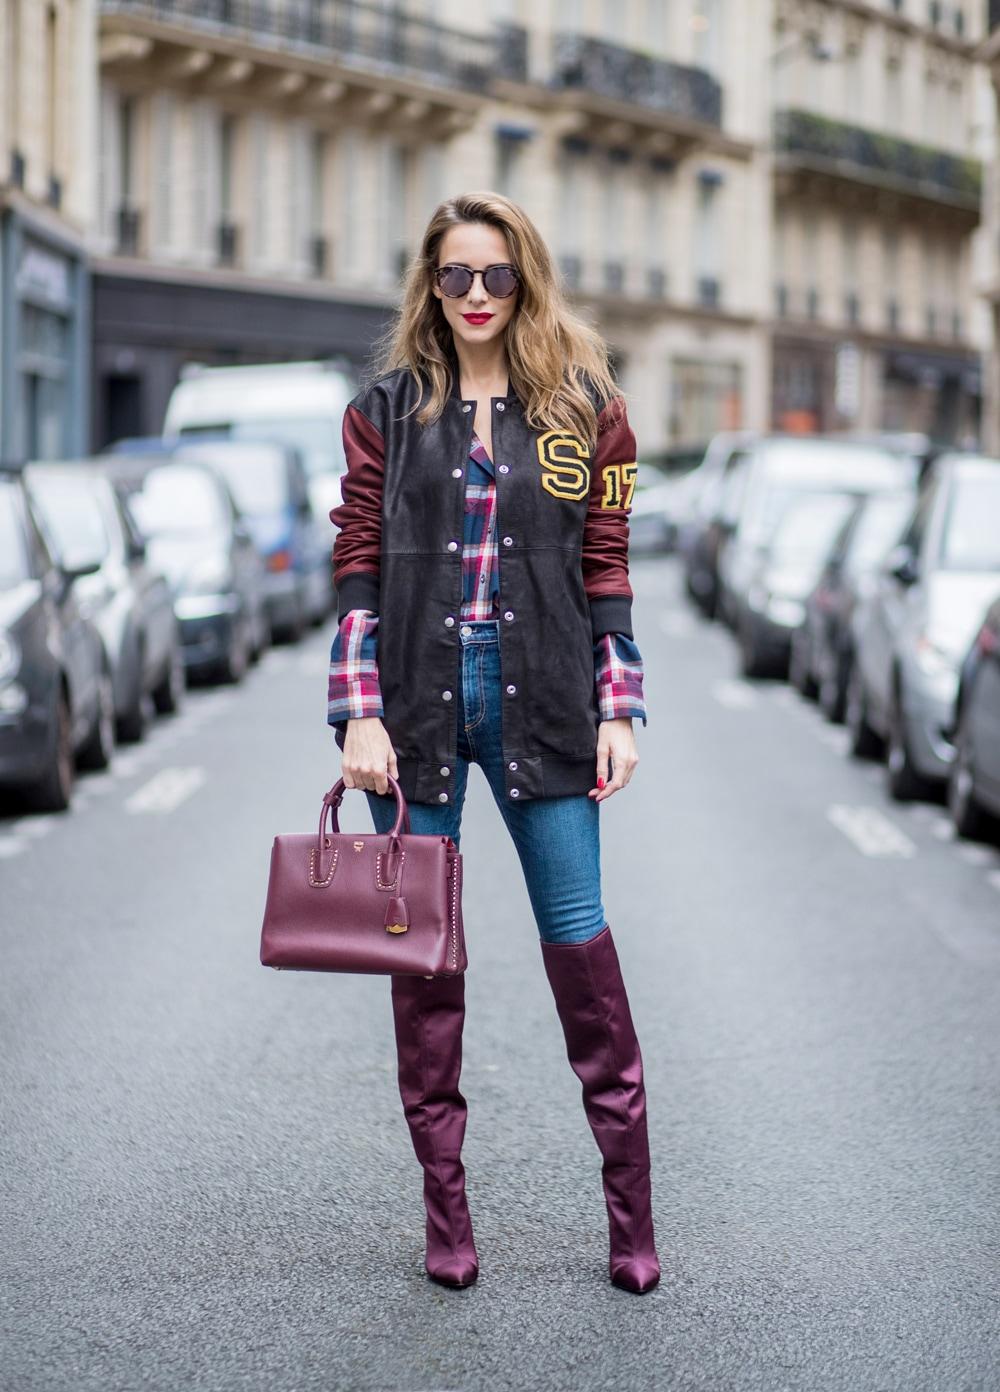 panta stivali jeans cuissardes